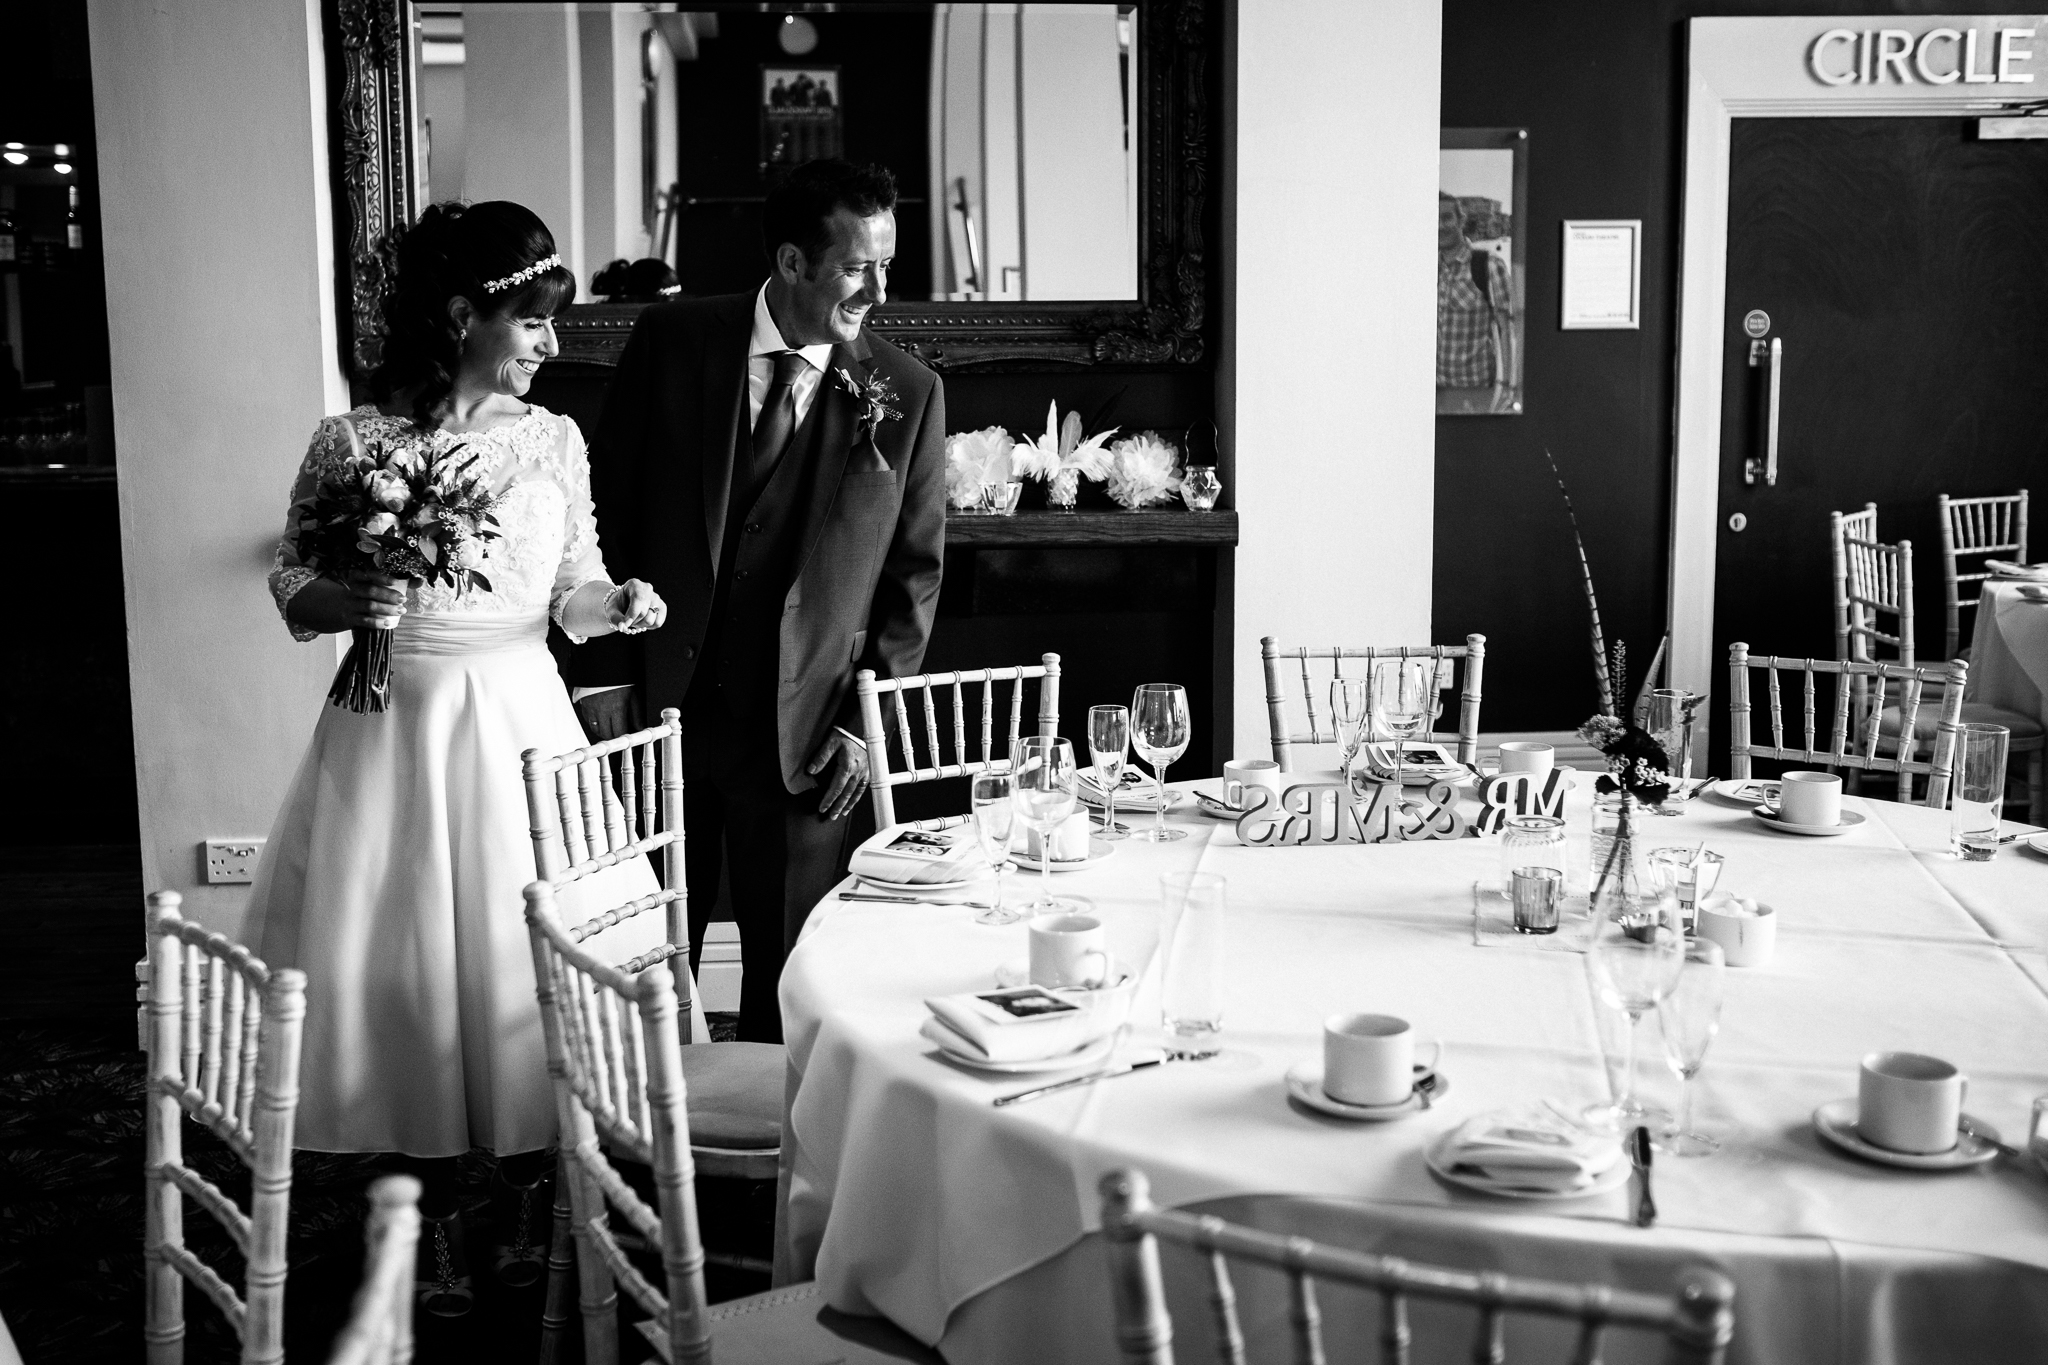 Cheshire Wedding Photography at Crewe Lyceum Theatre Stage Wedding Art Deco 20s - Jenny Harper-34.jpg